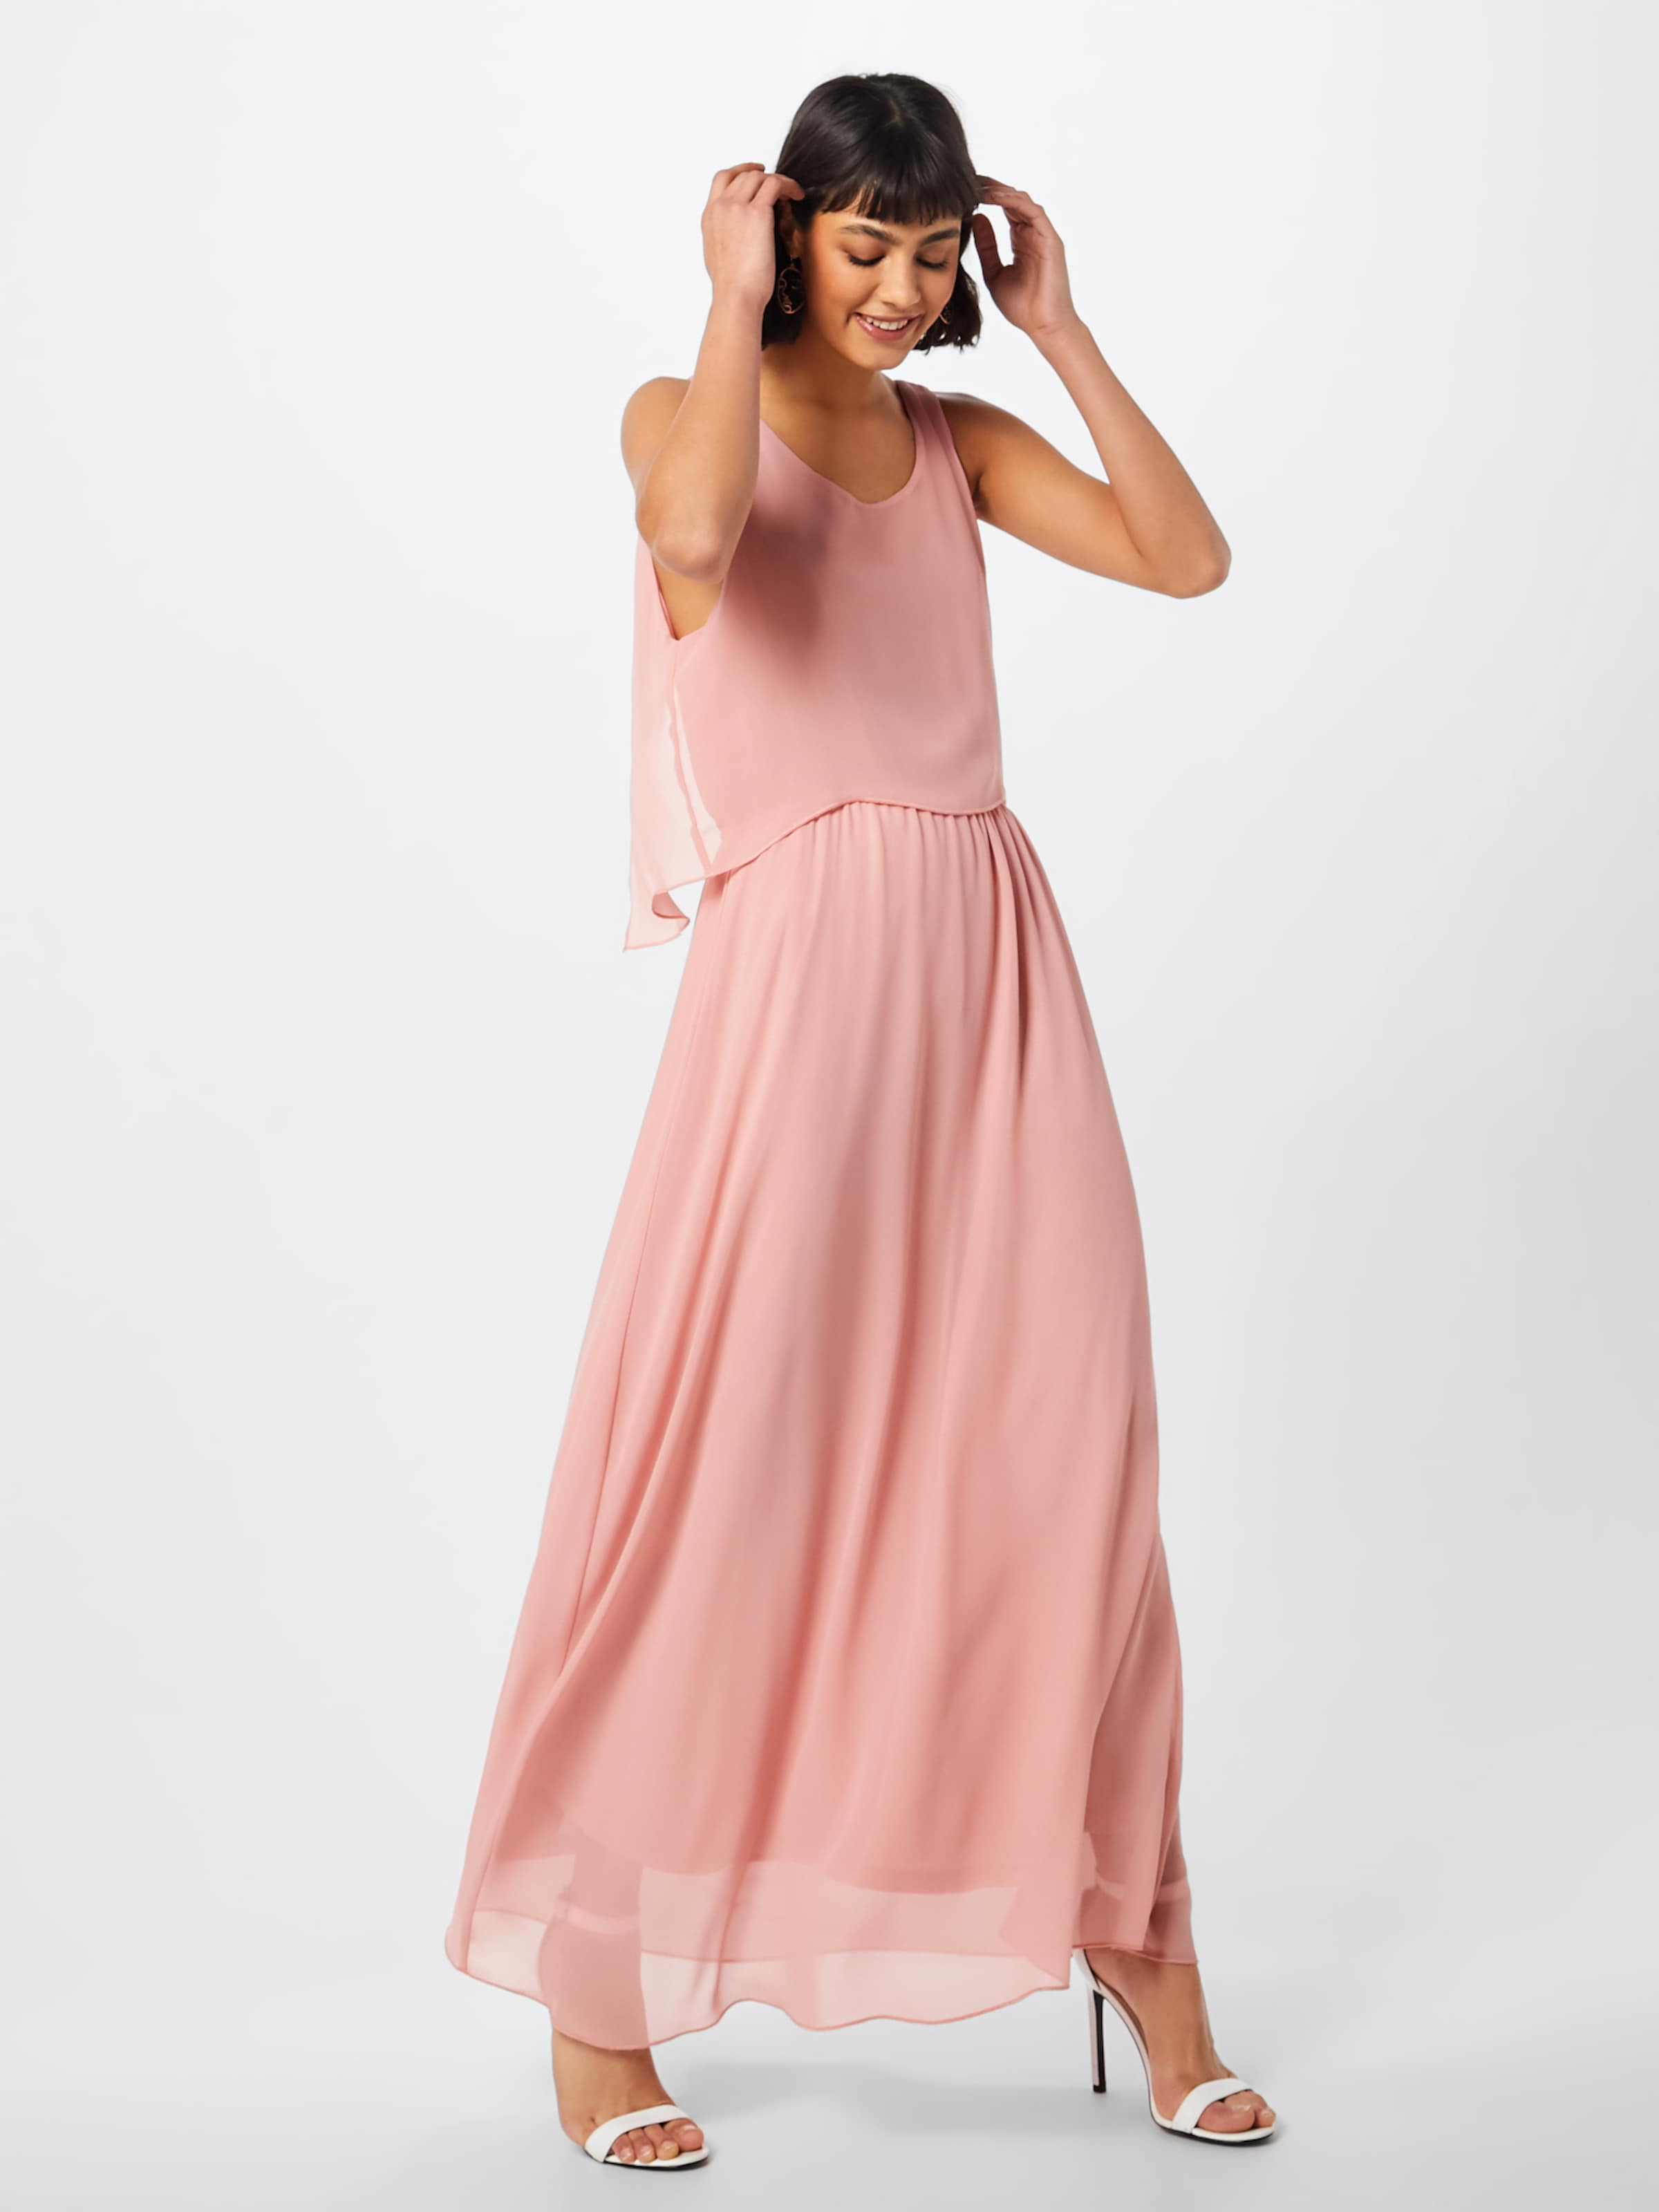 Rosé Saint En De Tropez Soirée Robe CdBoWrxe